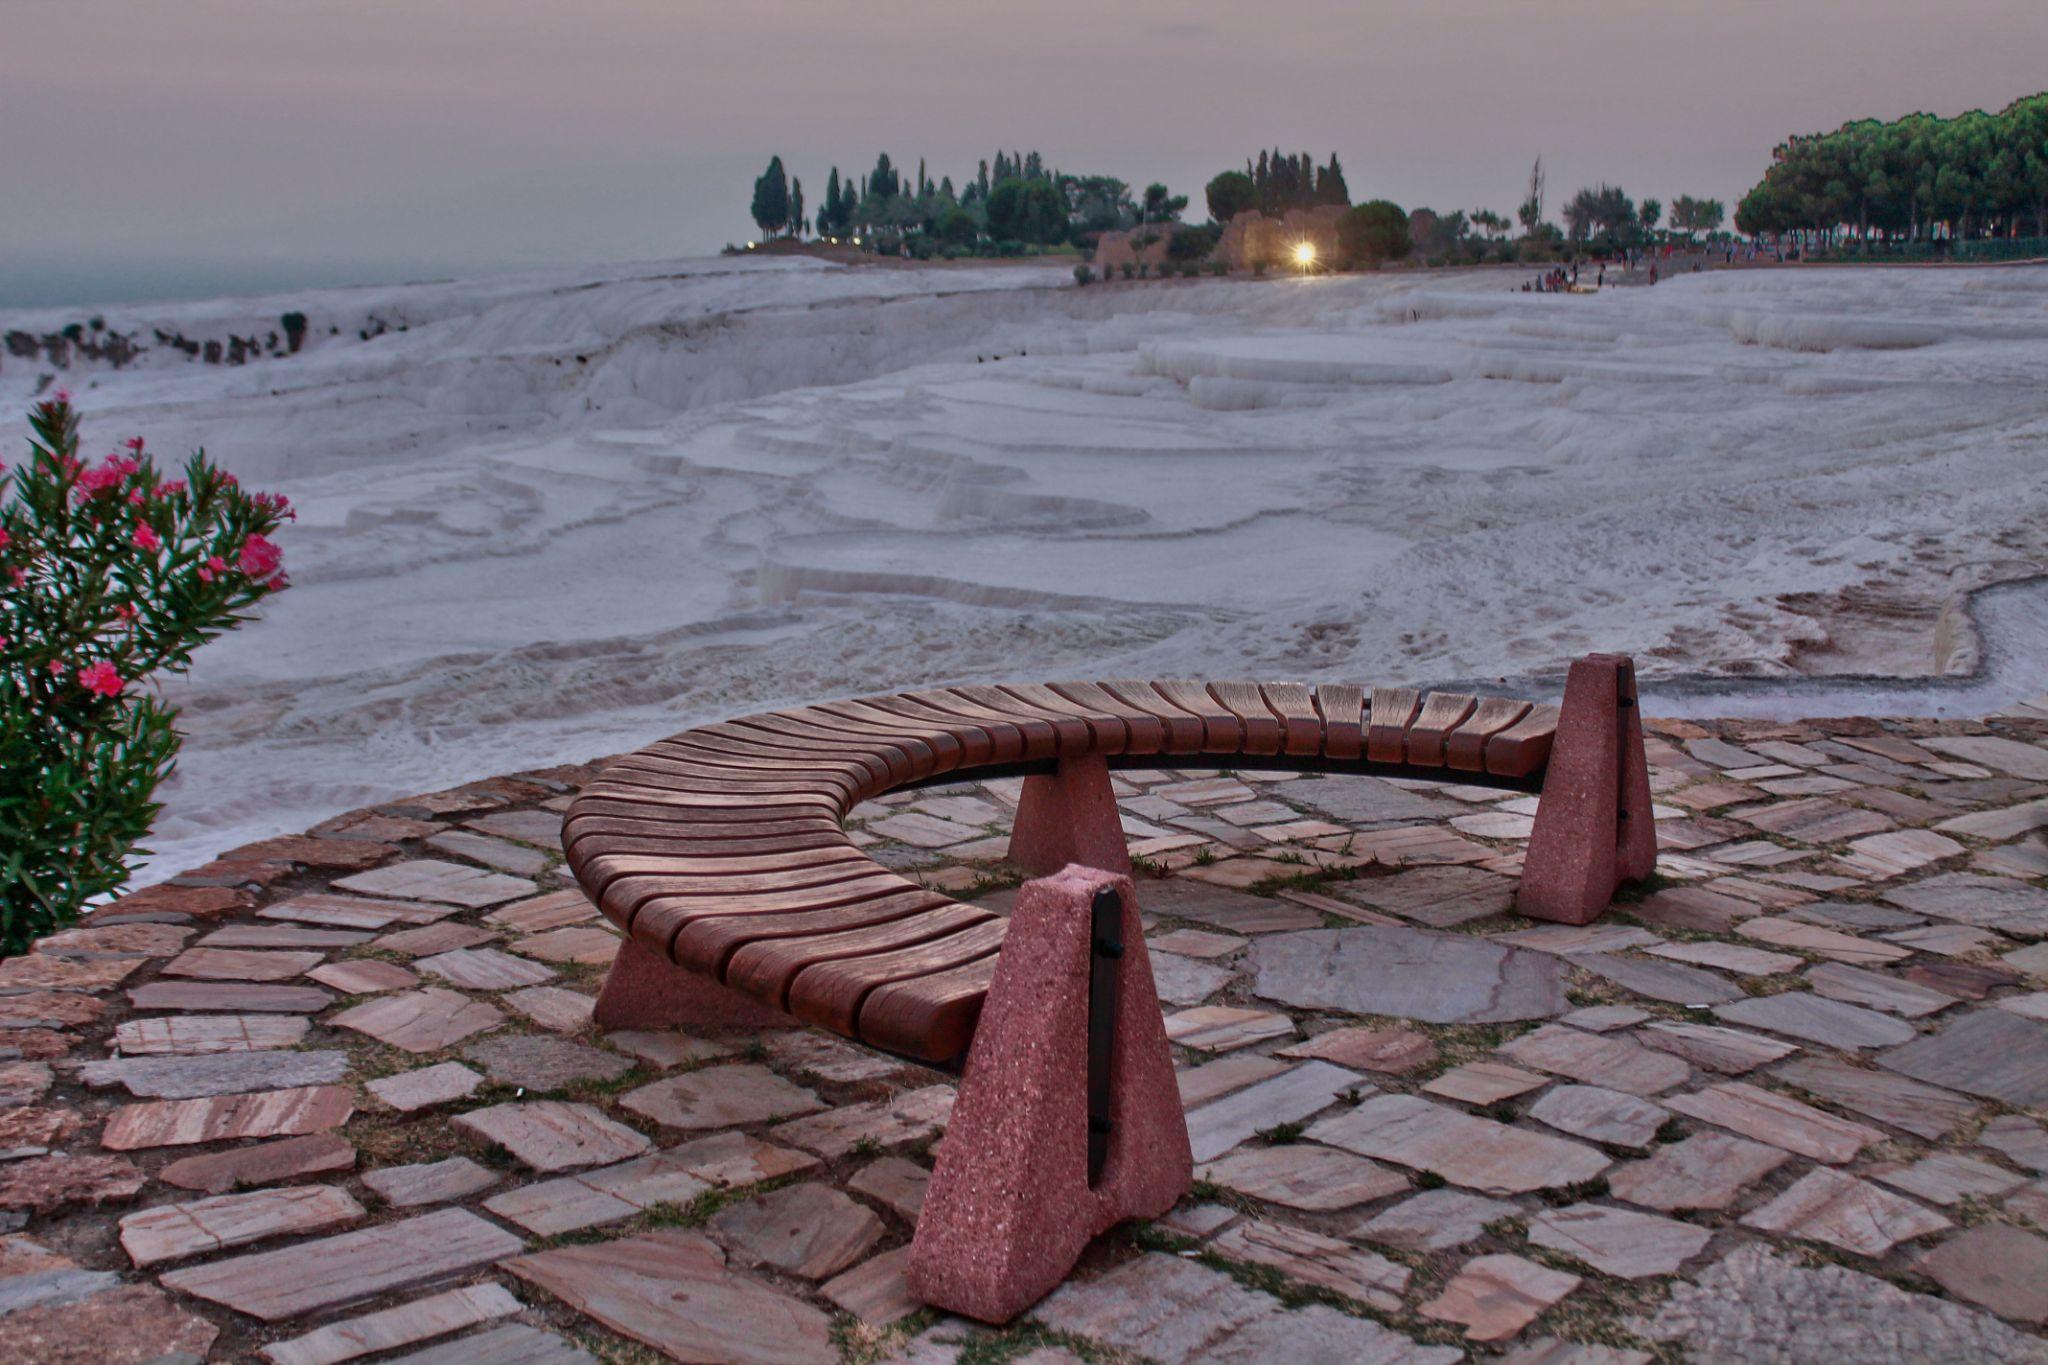 Early Evening in Pamukkale by Ayberk SOYLU